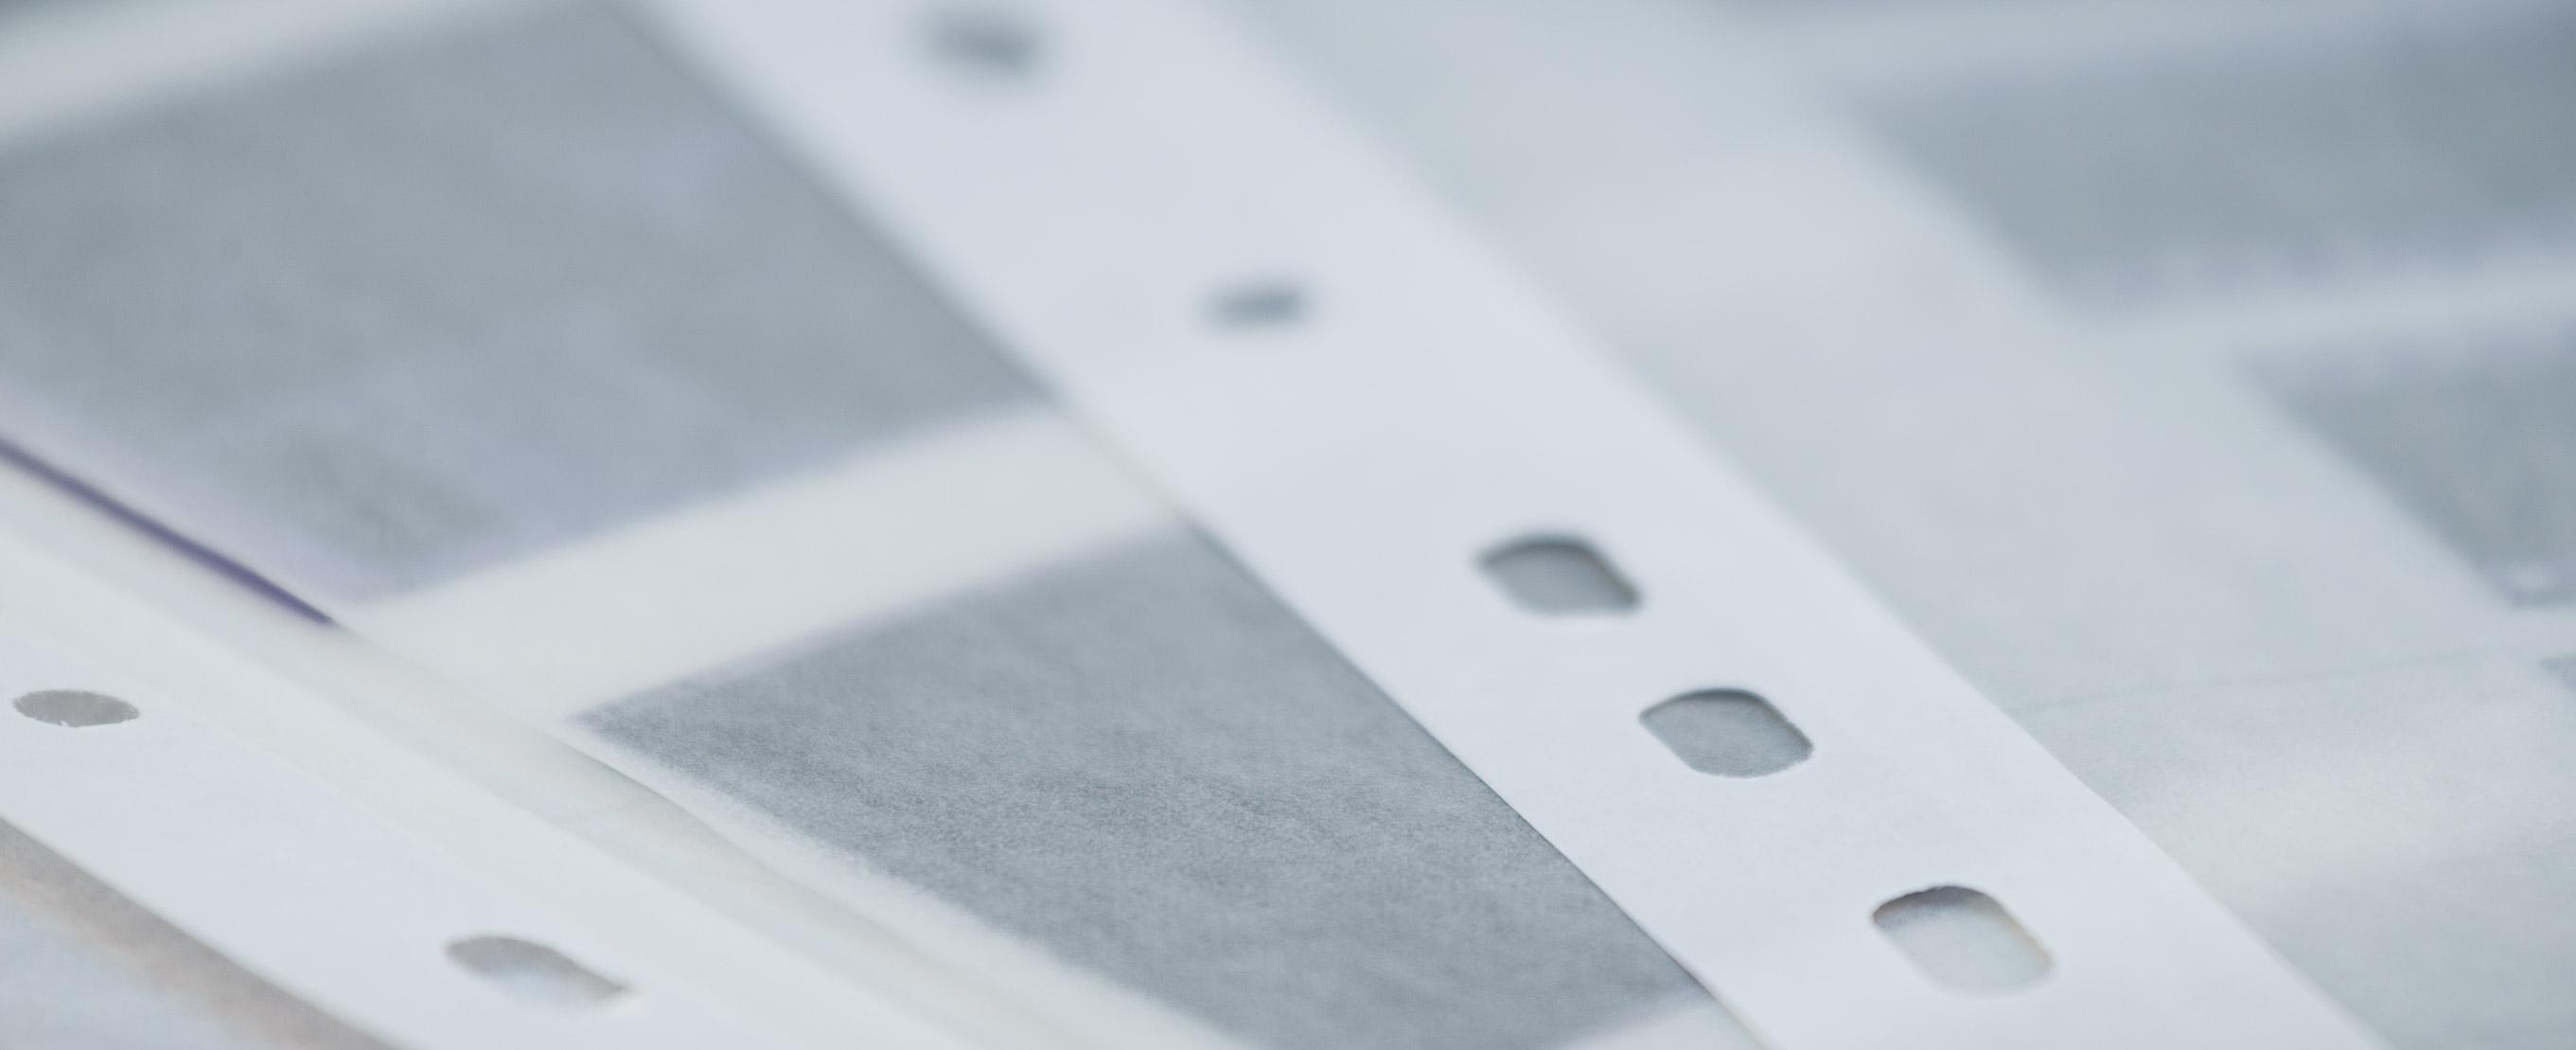 Archival Negative Sheets, Darkroom, Malta, Alan Falzon, Film, Analog, 35mm